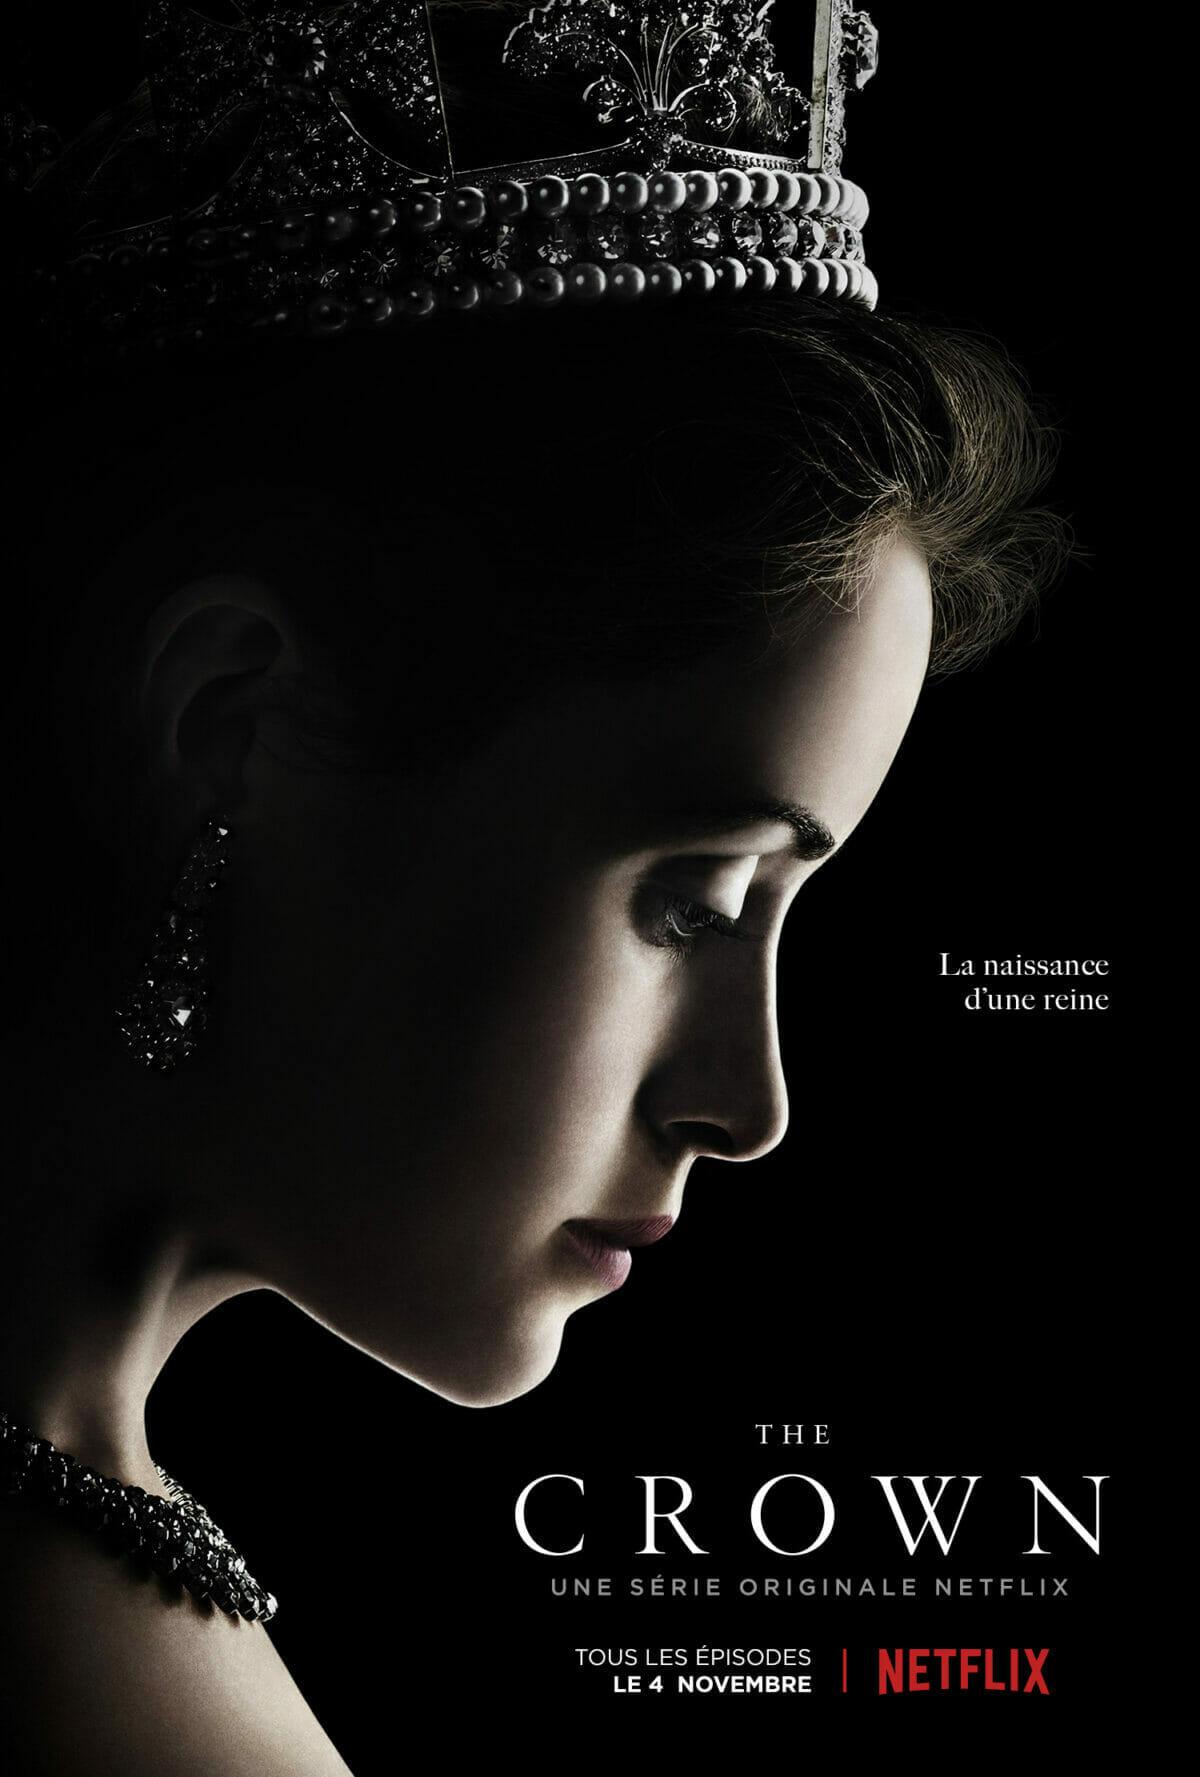 the-crown-saison-1-poster